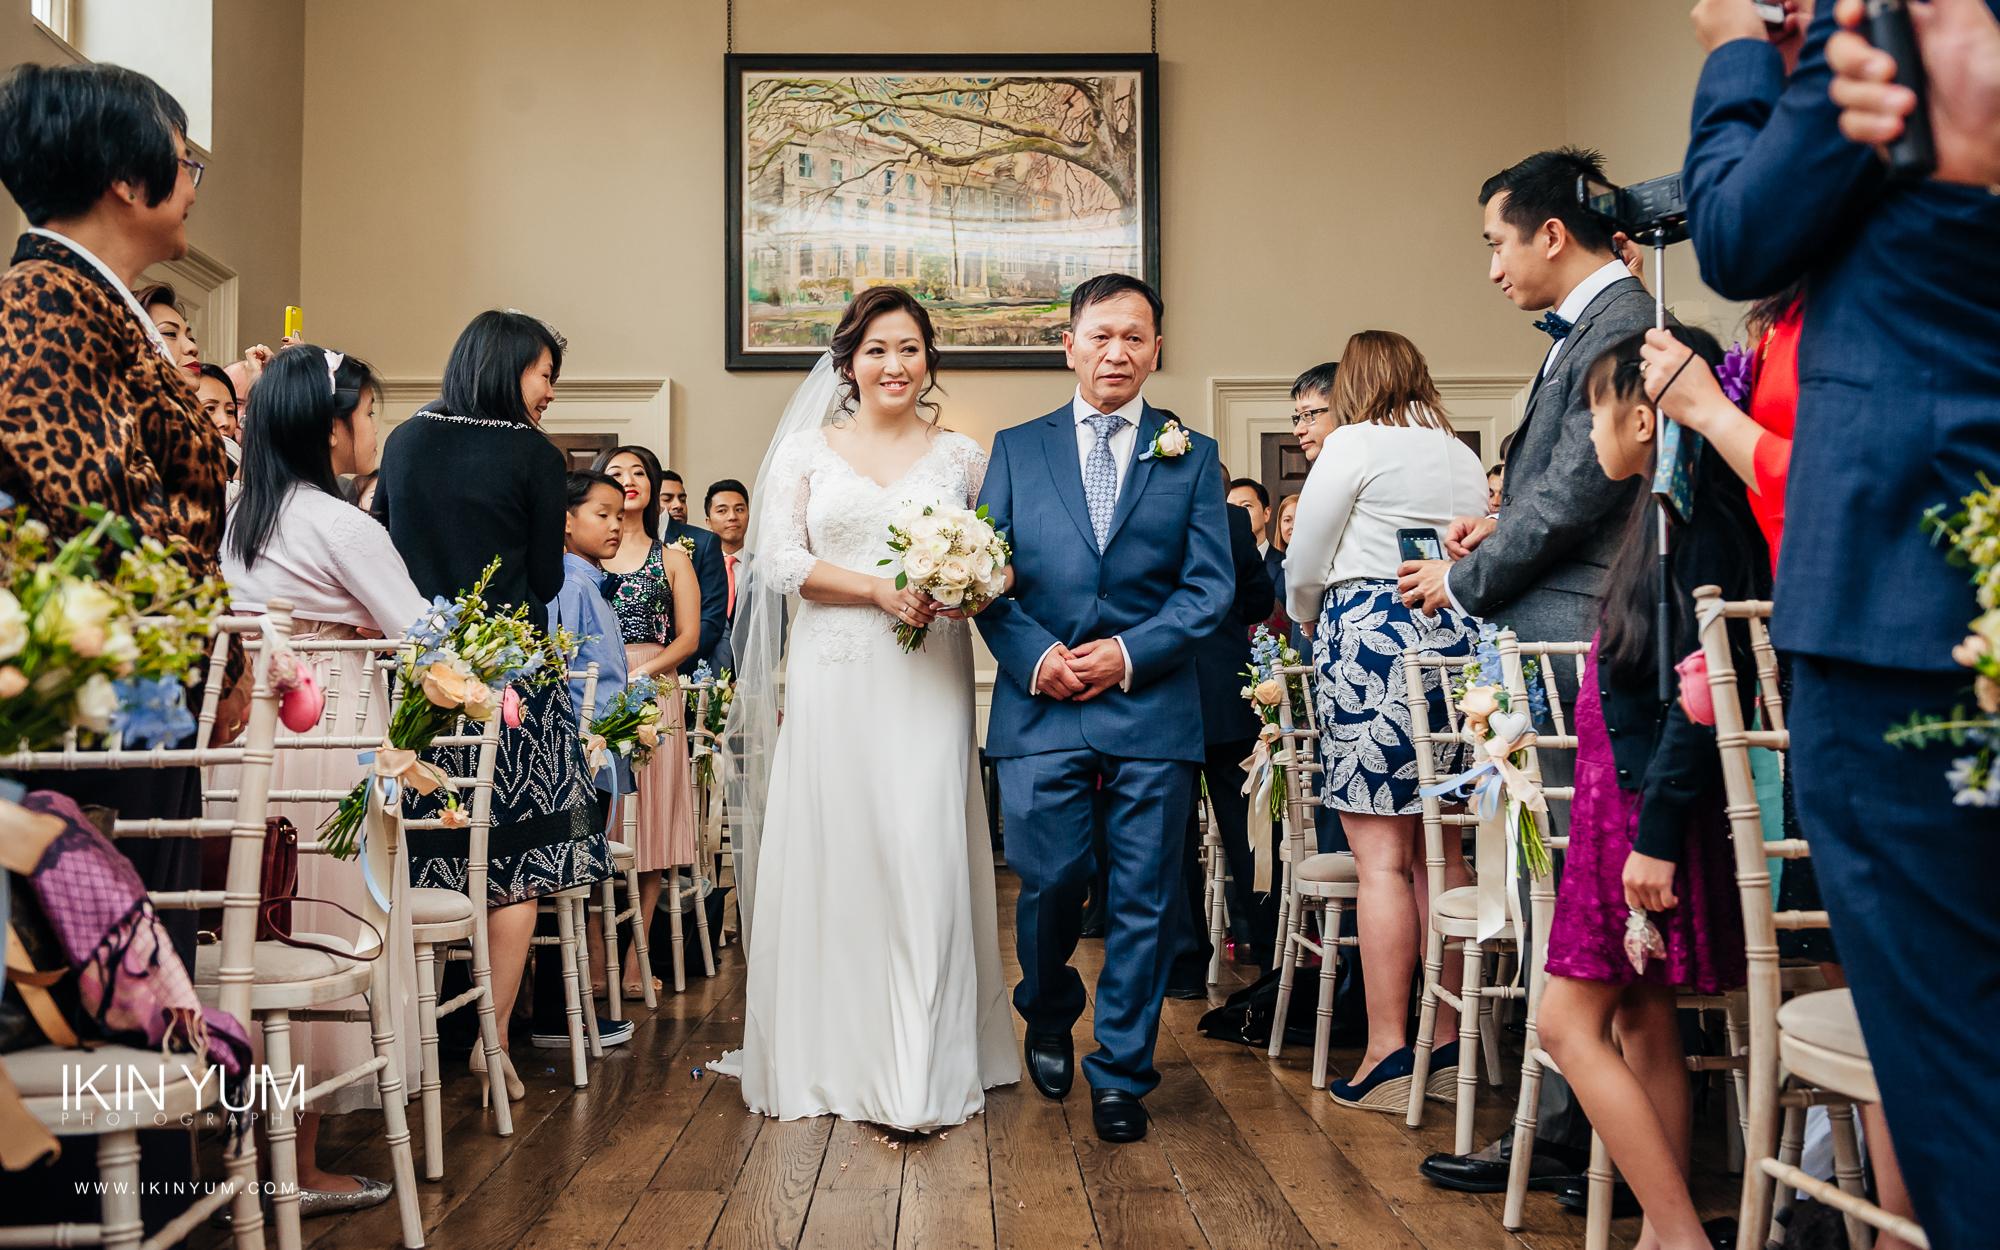 Elmore Court Wedding- Ikin Yum Photography-0053.jpg